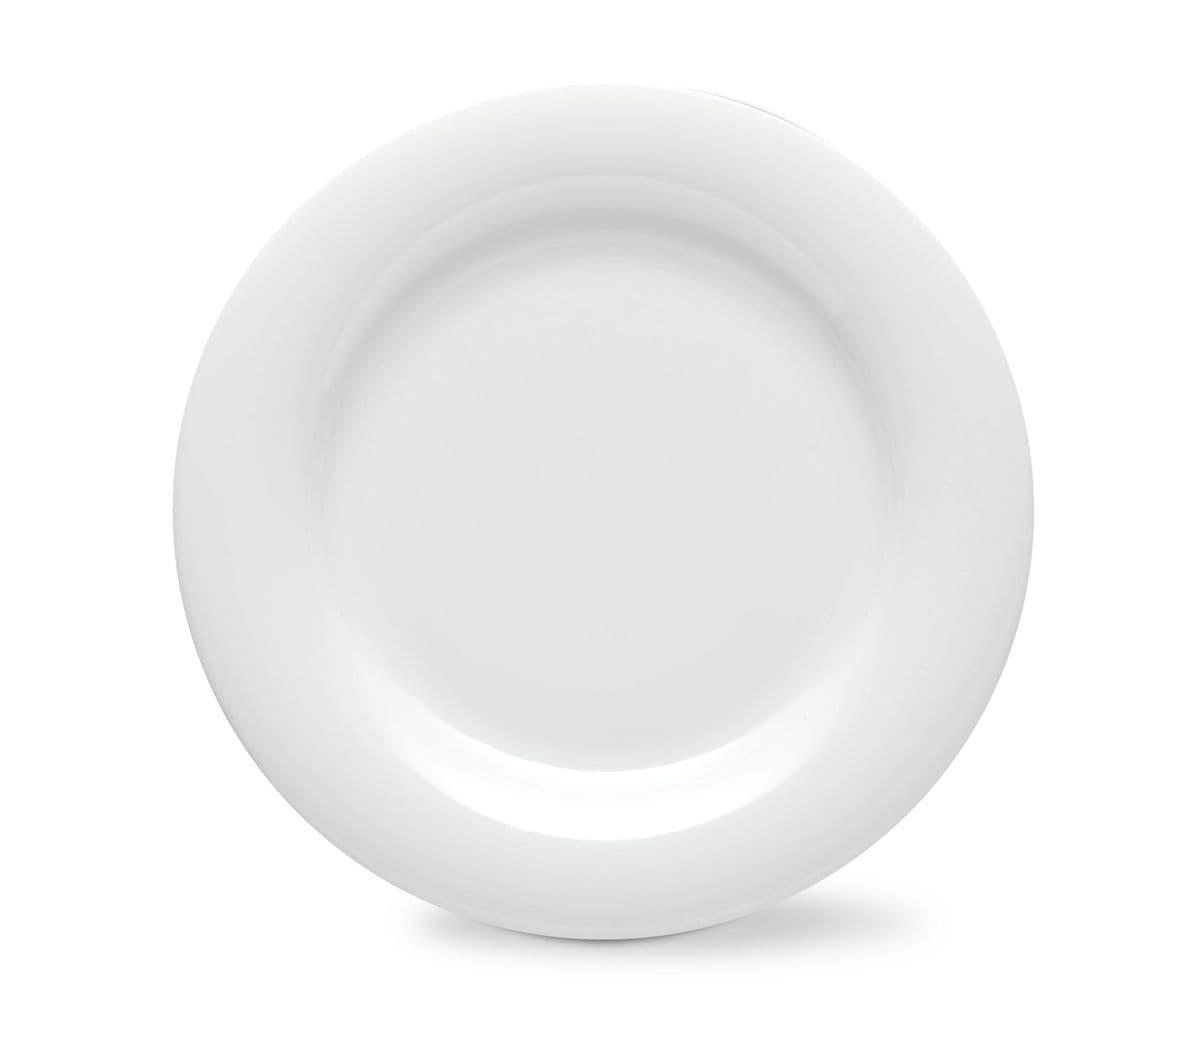 Cucina & Tavola COOL Dessertteller